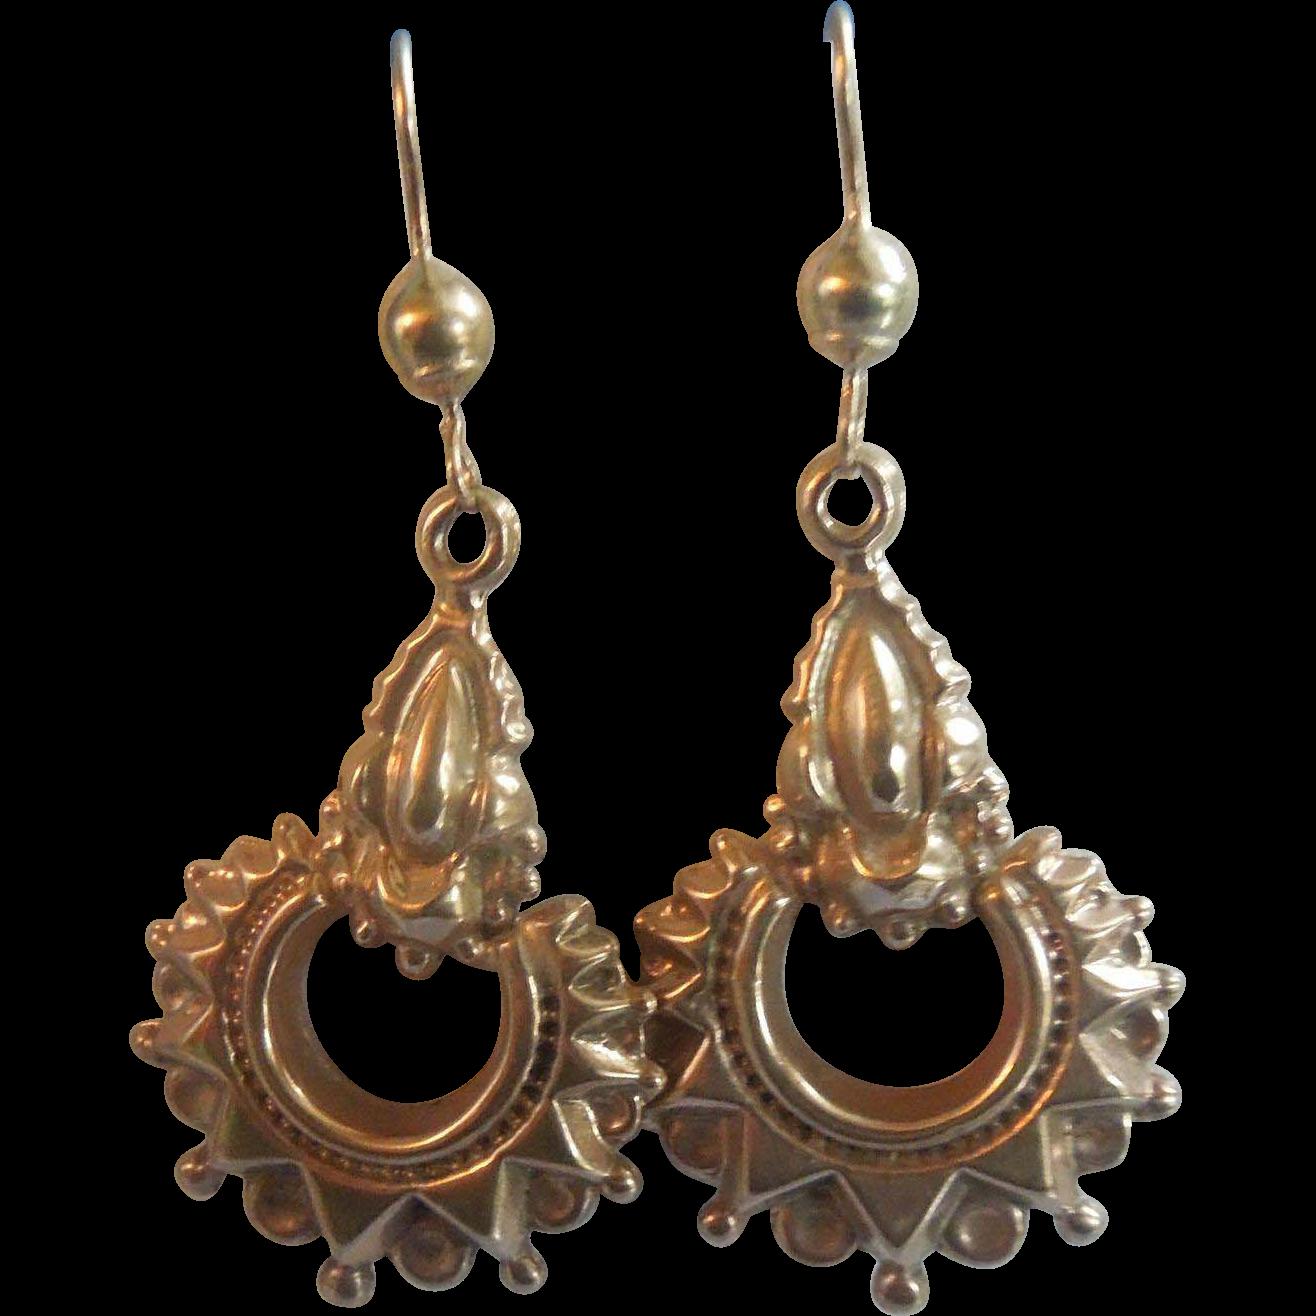 9 carat gold earrings, Victorian